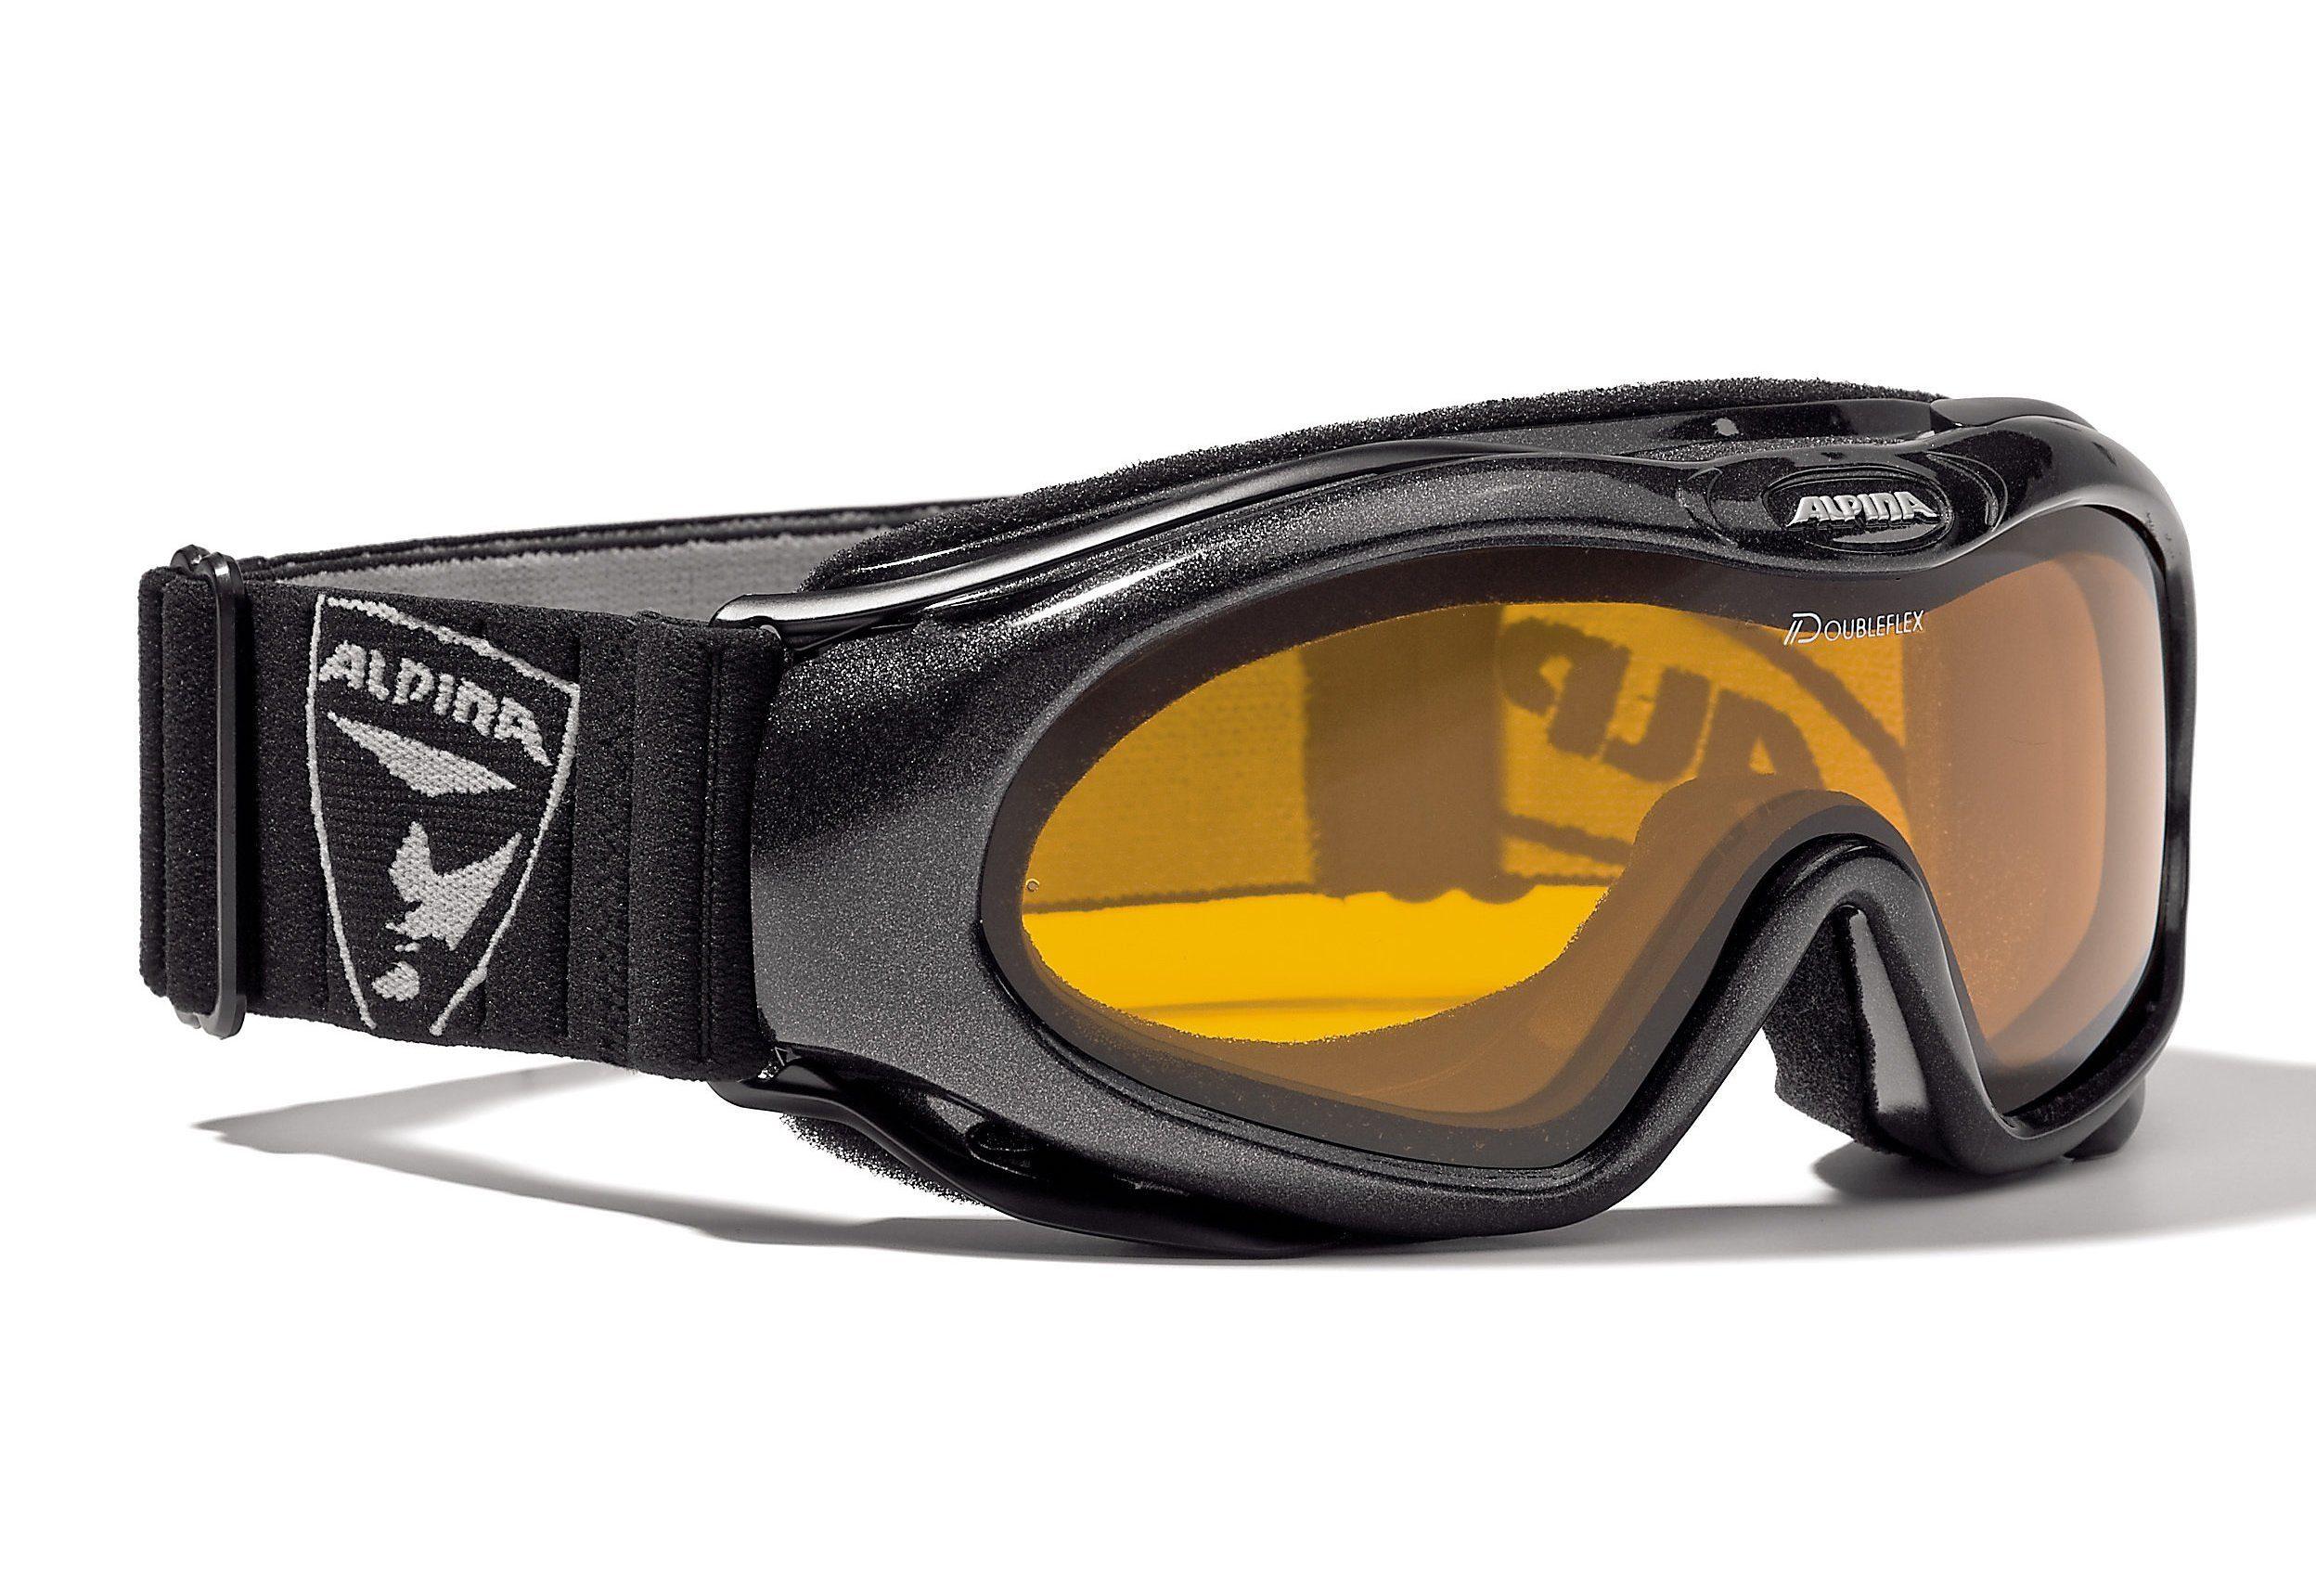 Skibrille, Alpina, »Bonfire A7015133«